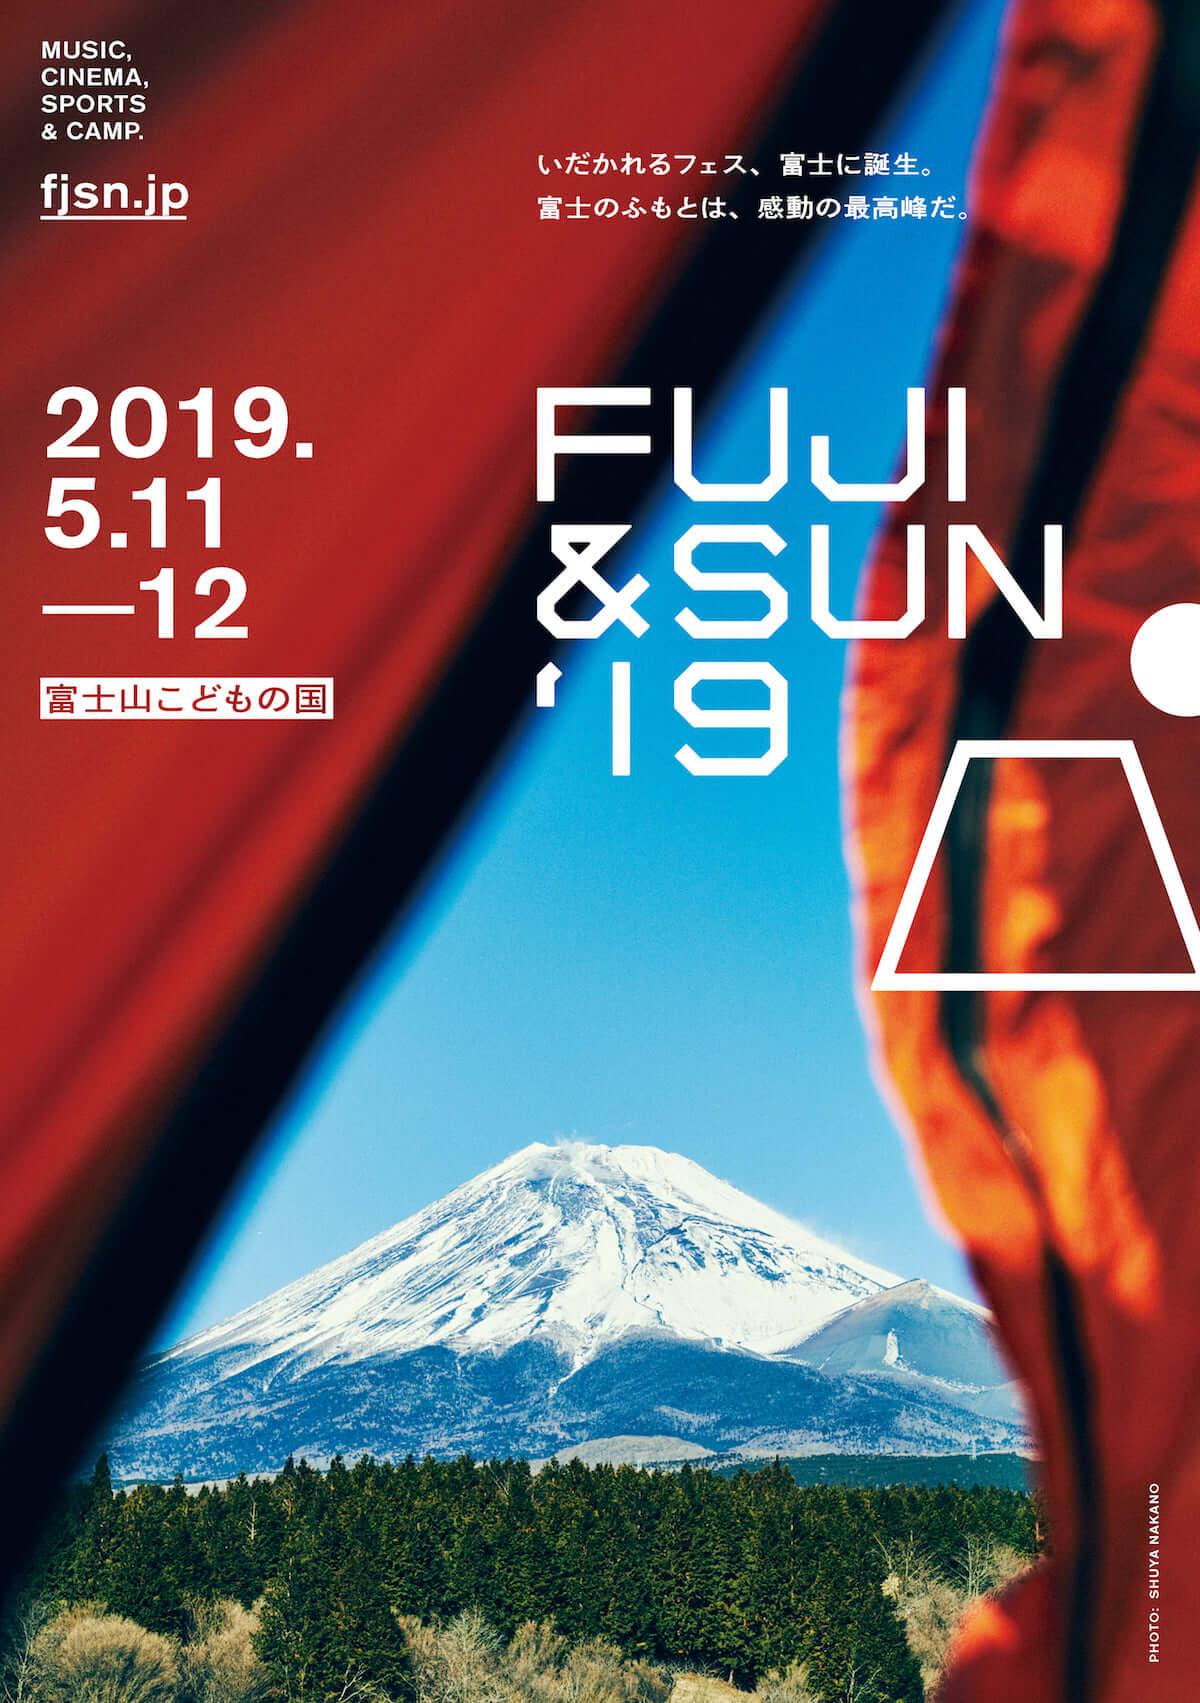 WOWOW主催野外フェス<FUJI&SUN '19>開催|第3弾にYogee New Waves、cero、MOROHA、Chara、矢野顕子ほか6組が追加 music190327_fujiandsun_1-1200x1703